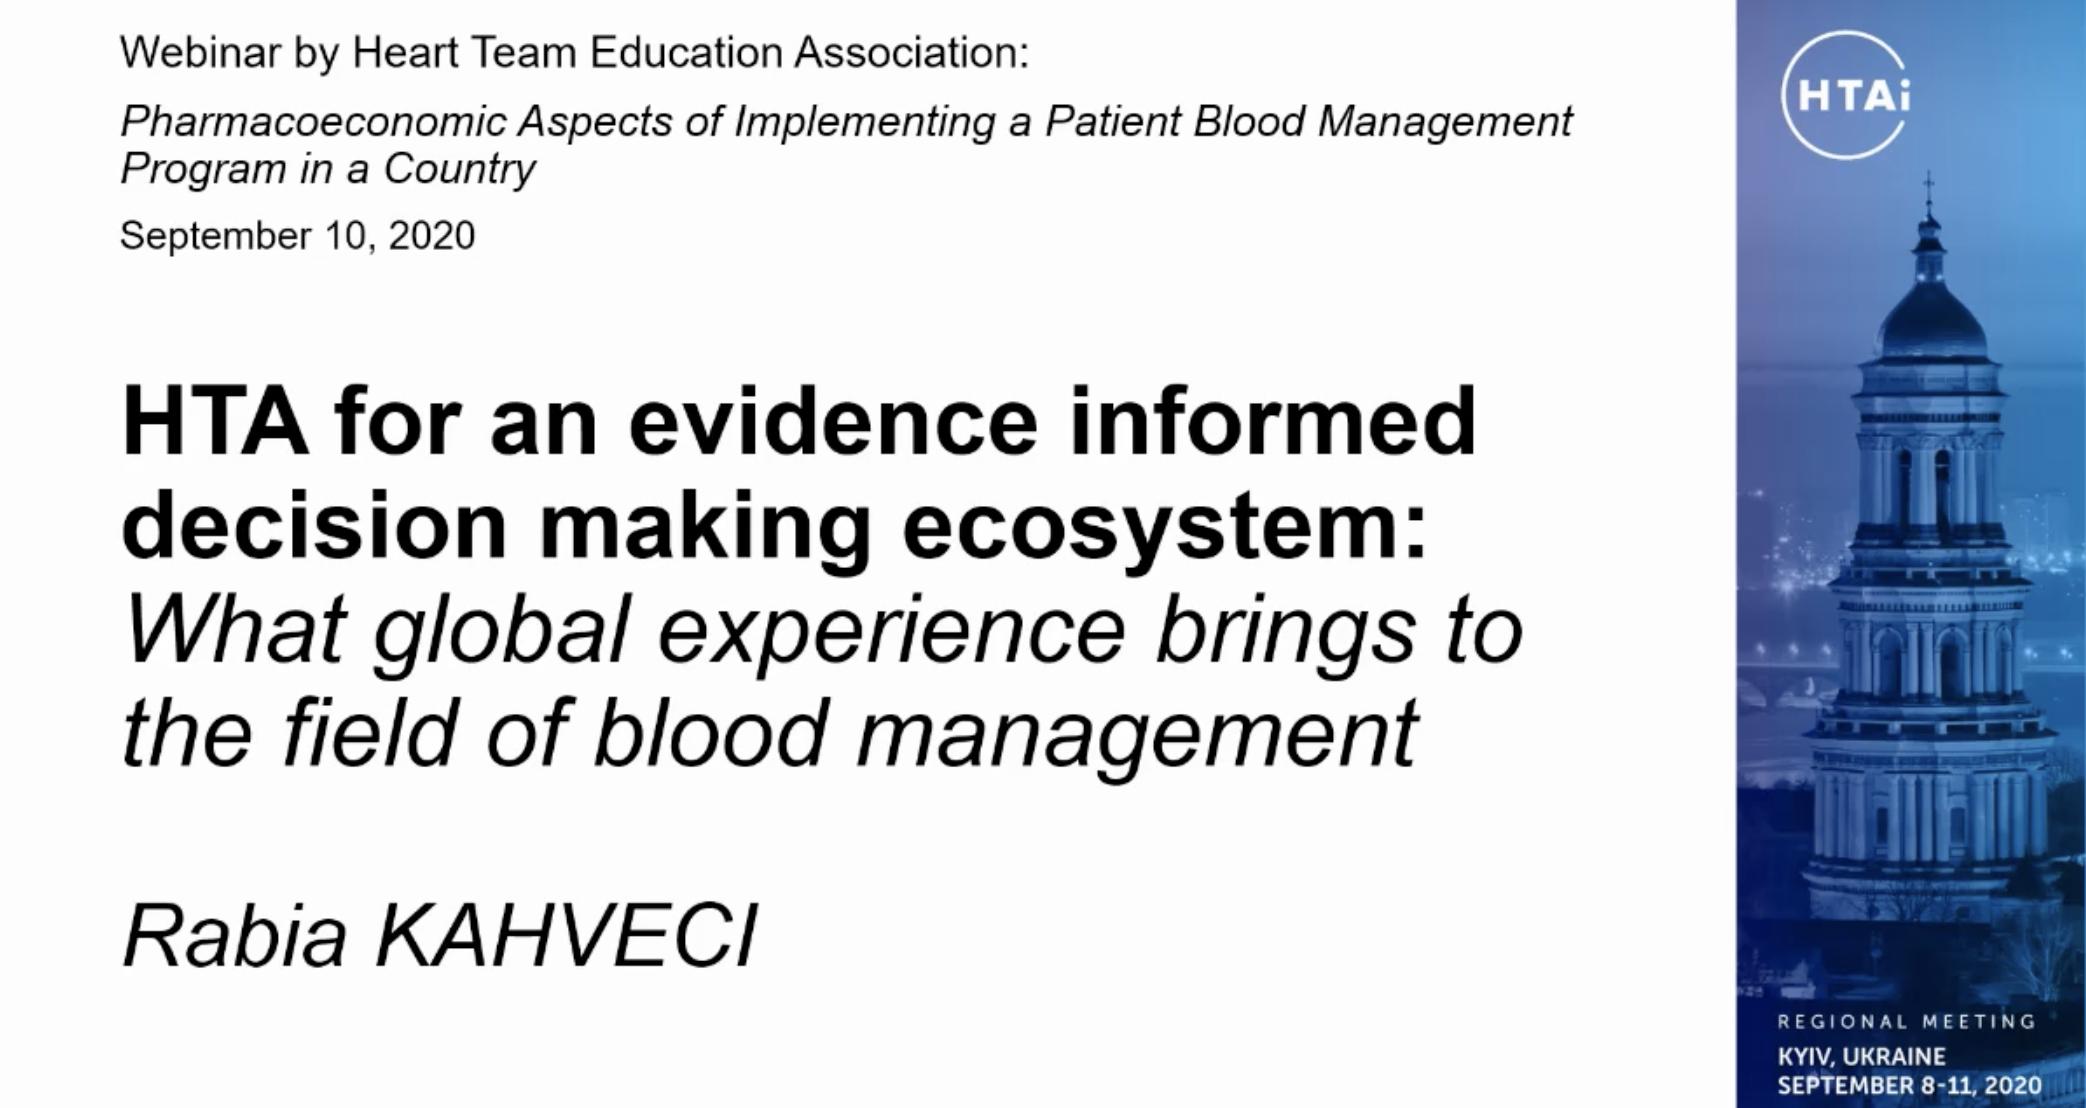 HTA for an evidence informed decision making ecosystem - R. Kahveci